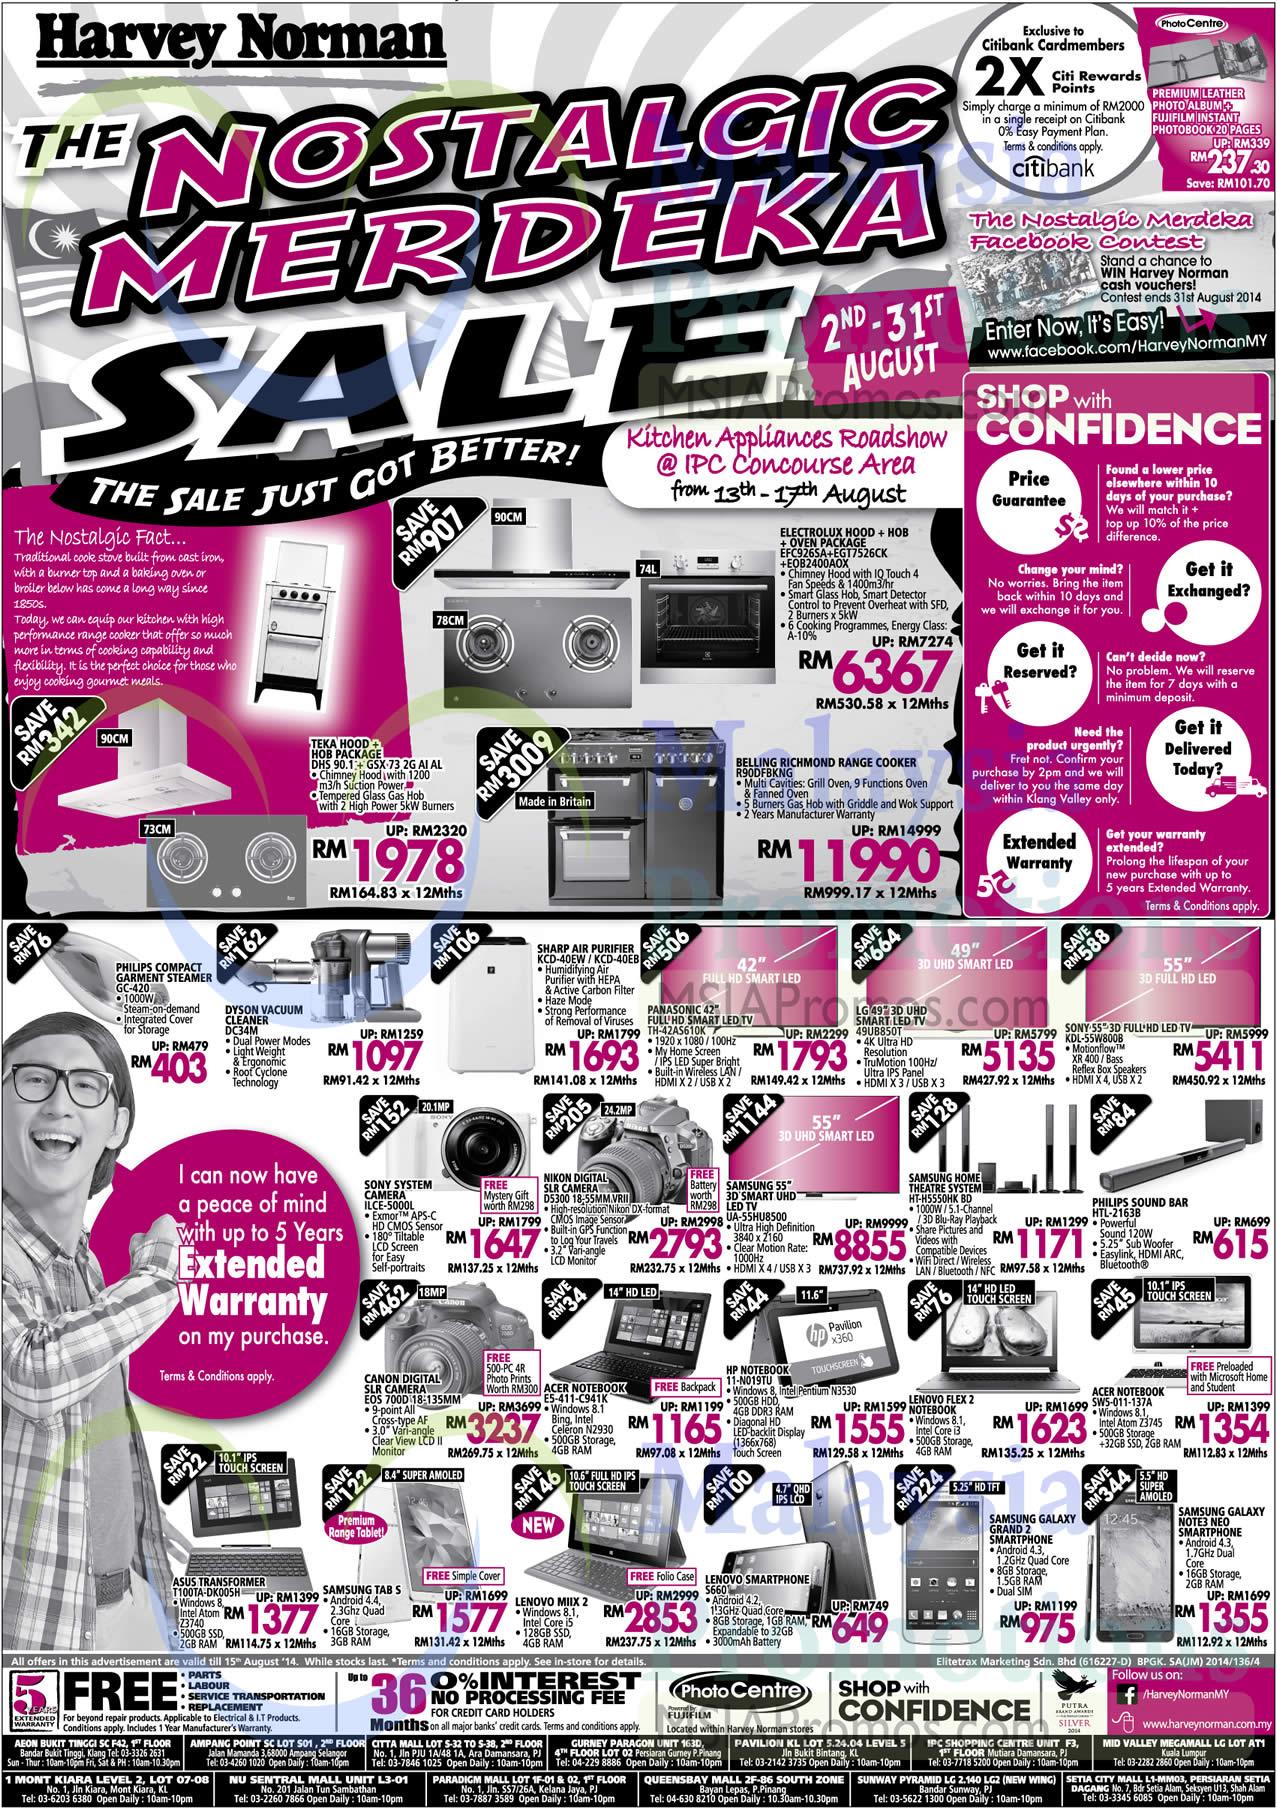 harvey norman digital cameras  furniture  notebooks  u0026 appliances offers 9  u2013 15 aug 2014